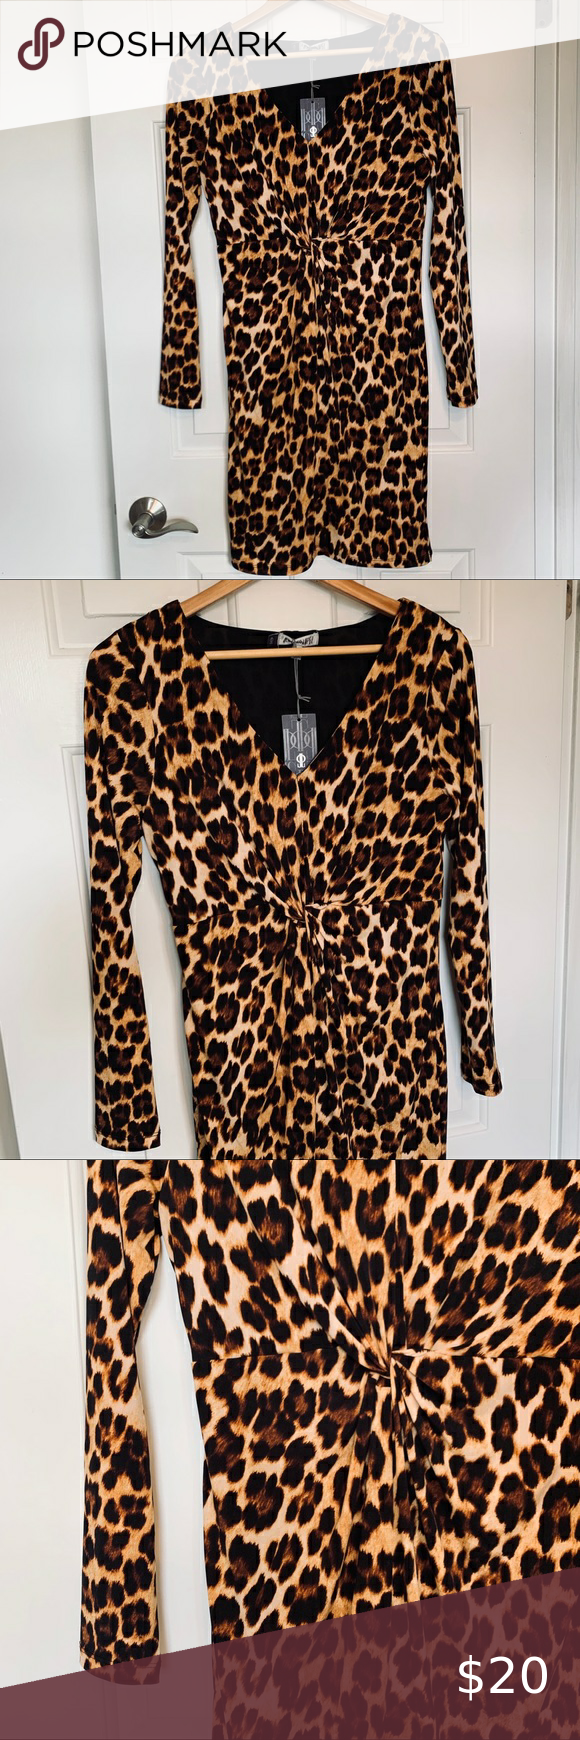 Long Sleeve Animal Print Dress By Jennifer Lopez Long Sleeve Animal Cheetah Print Dress By Jennifer Lopez Cheetah Print Dress Print Dress Animal Print Dresses [ 1740 x 580 Pixel ]